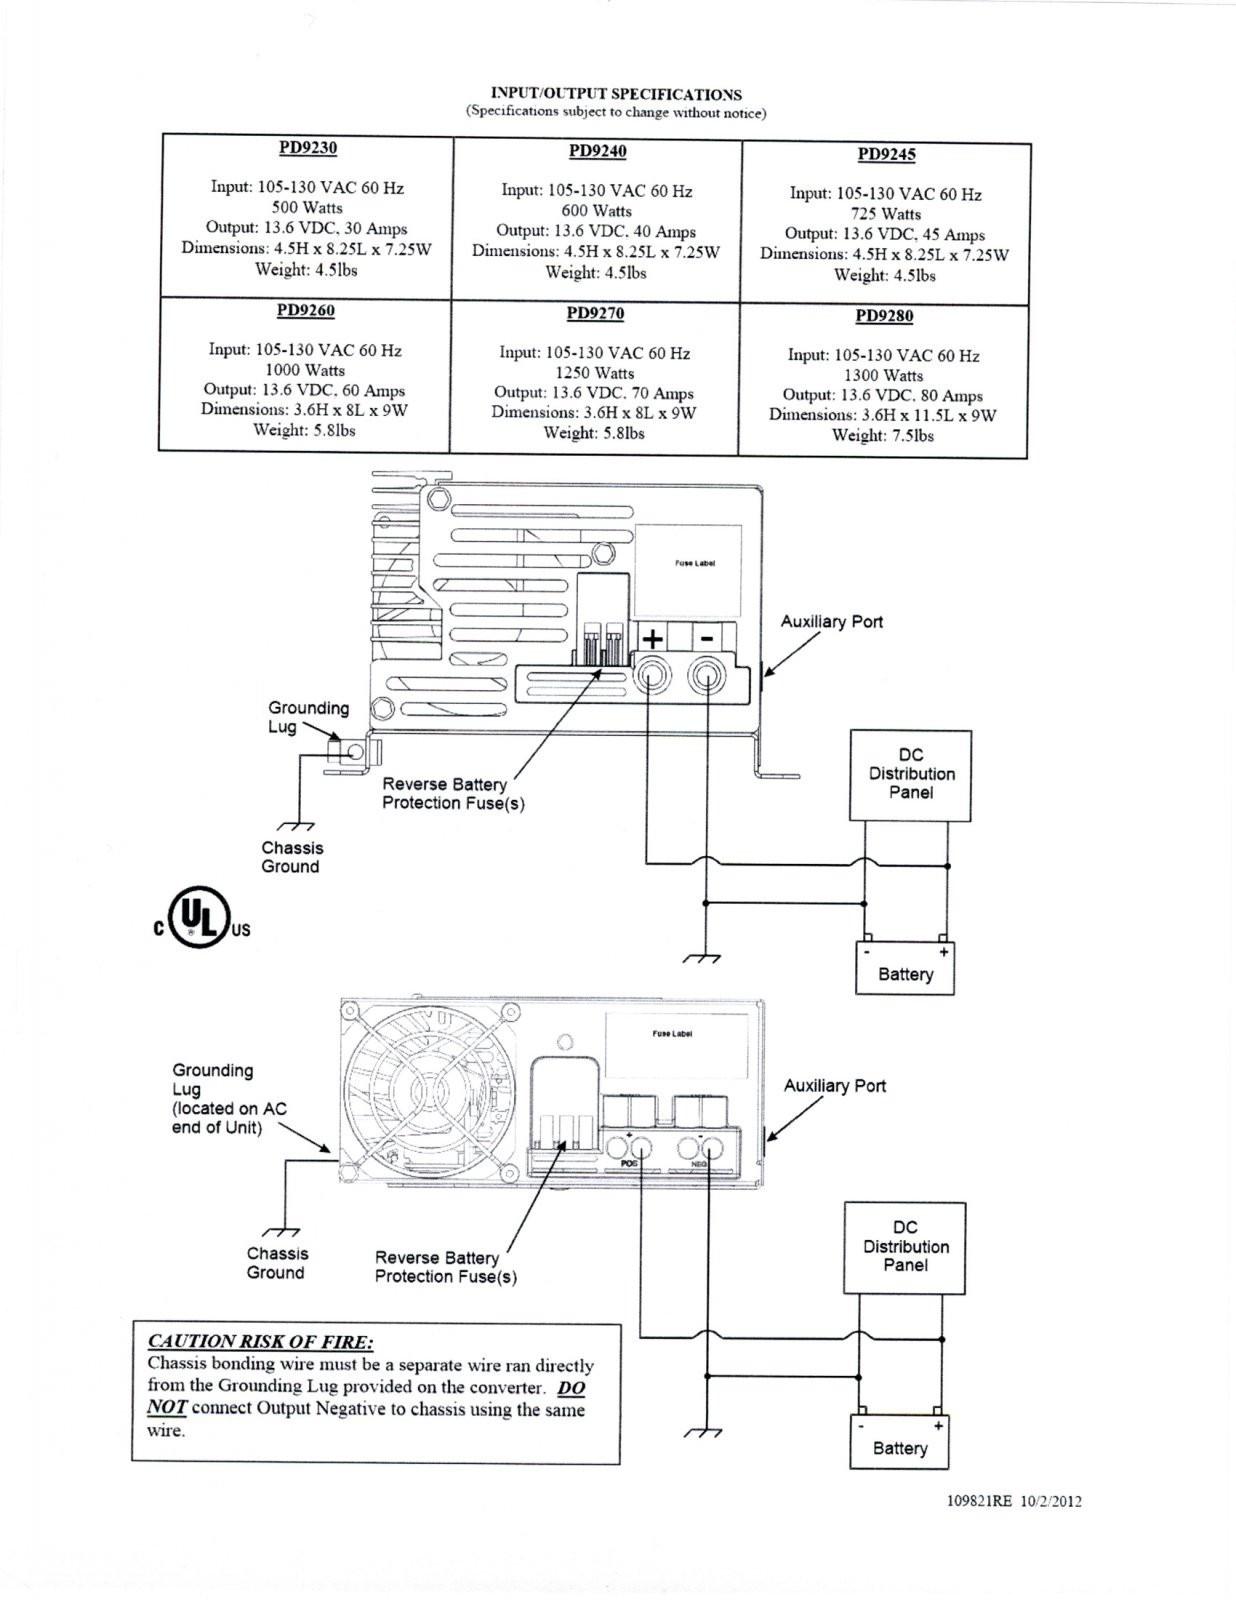 elixir converter wiring diagram trusted wiring diagrams free repair diagrams wiring diagram elixir industries wiring diagram and schematics tier 3 wiring diagram elixir converter wiring diagram